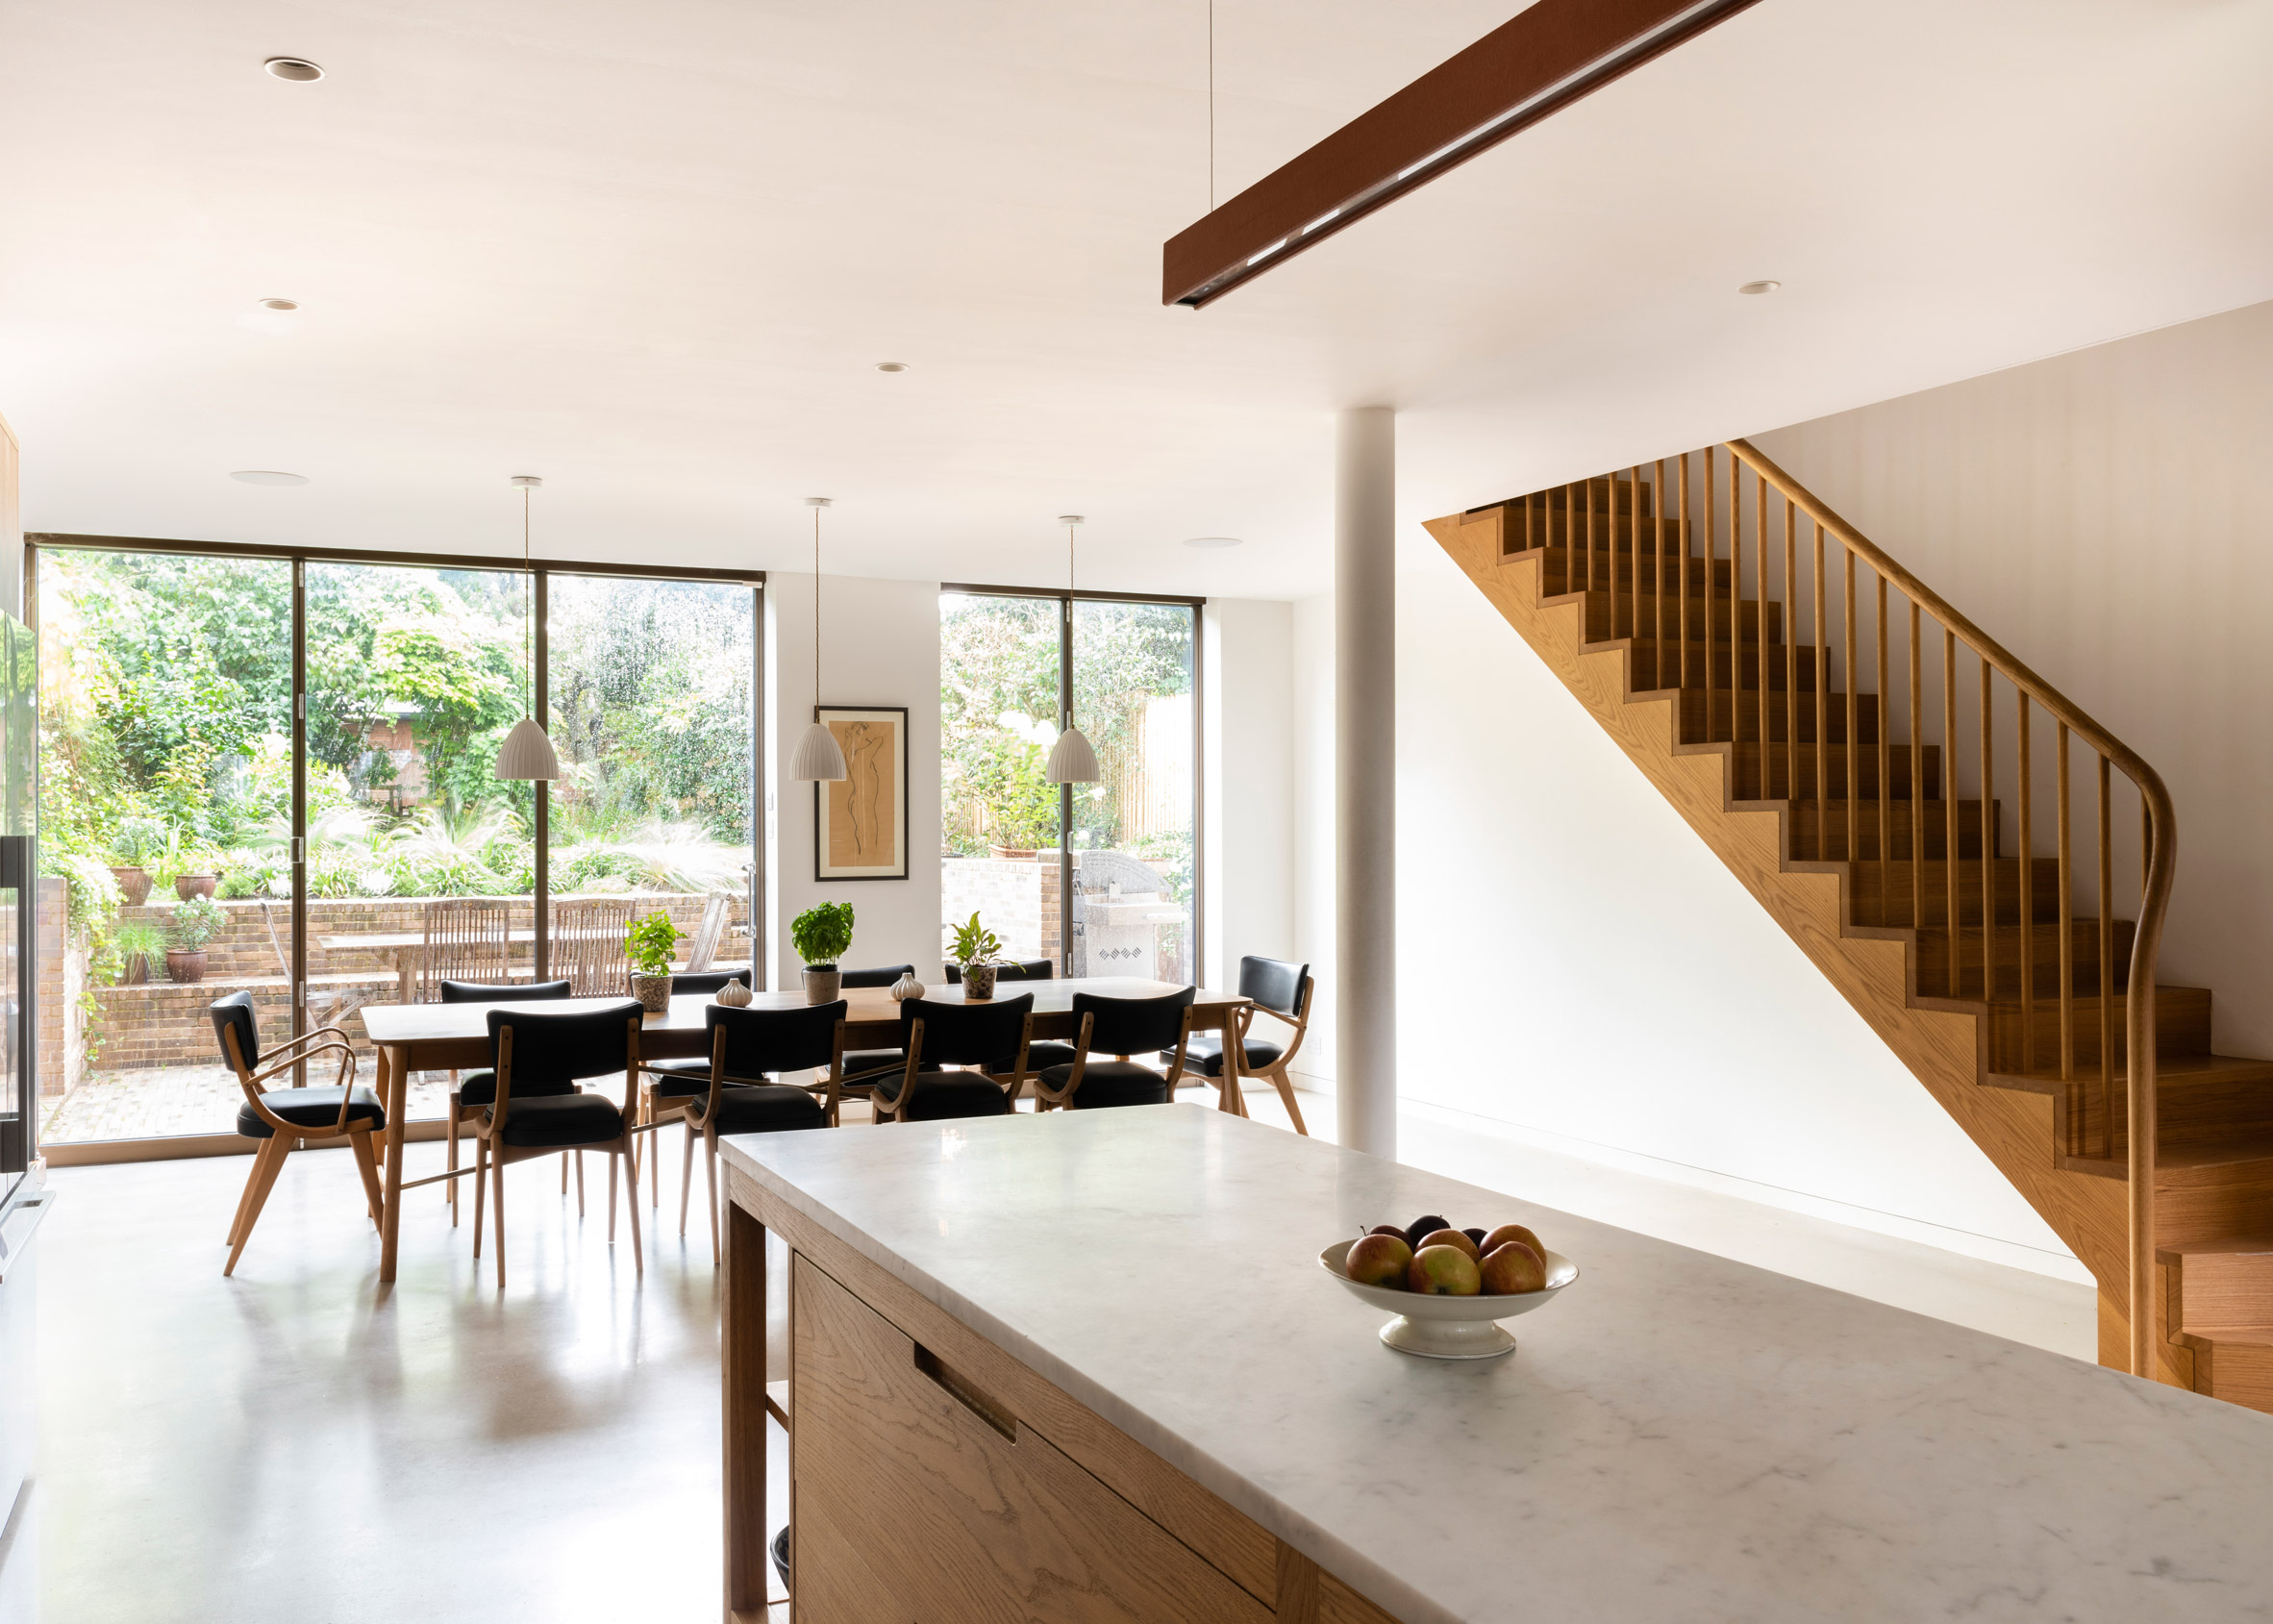 Dartmouth Park Family House, Camden, by Pardon Chambers Architects